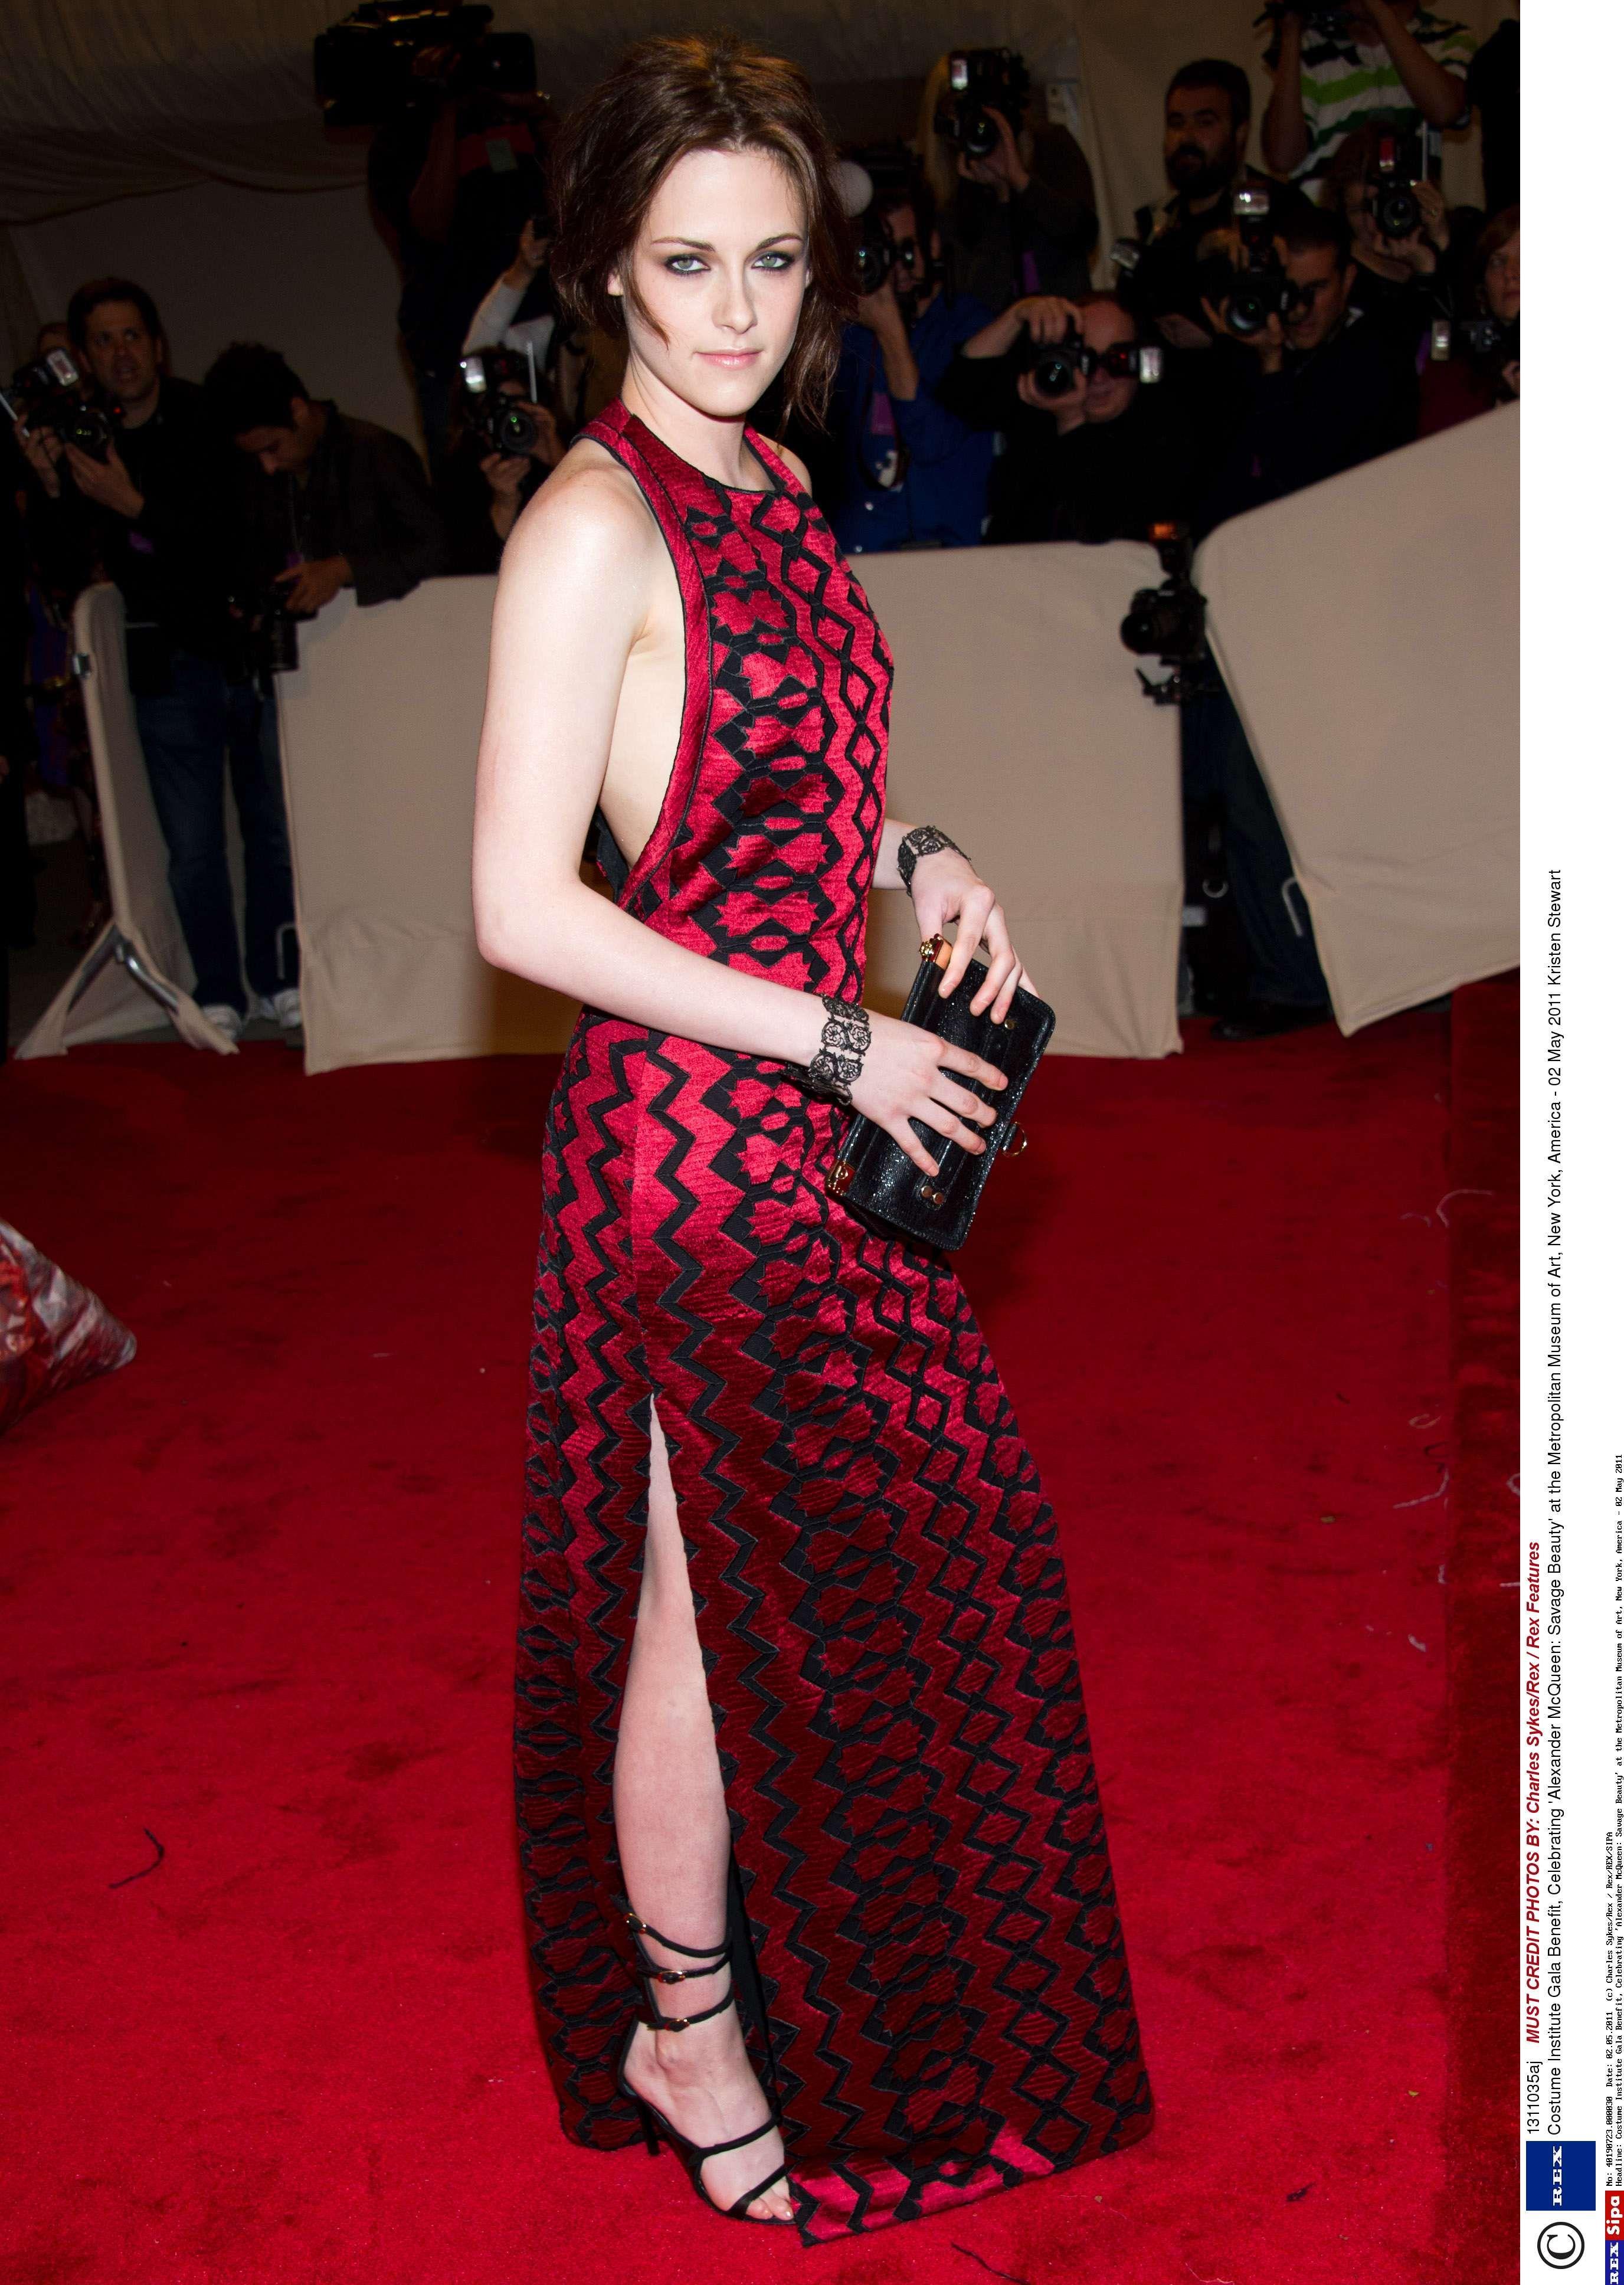 Kellan Lutz rencontre Selena Gomez espoir de datation Choi SAE ROM KBS2